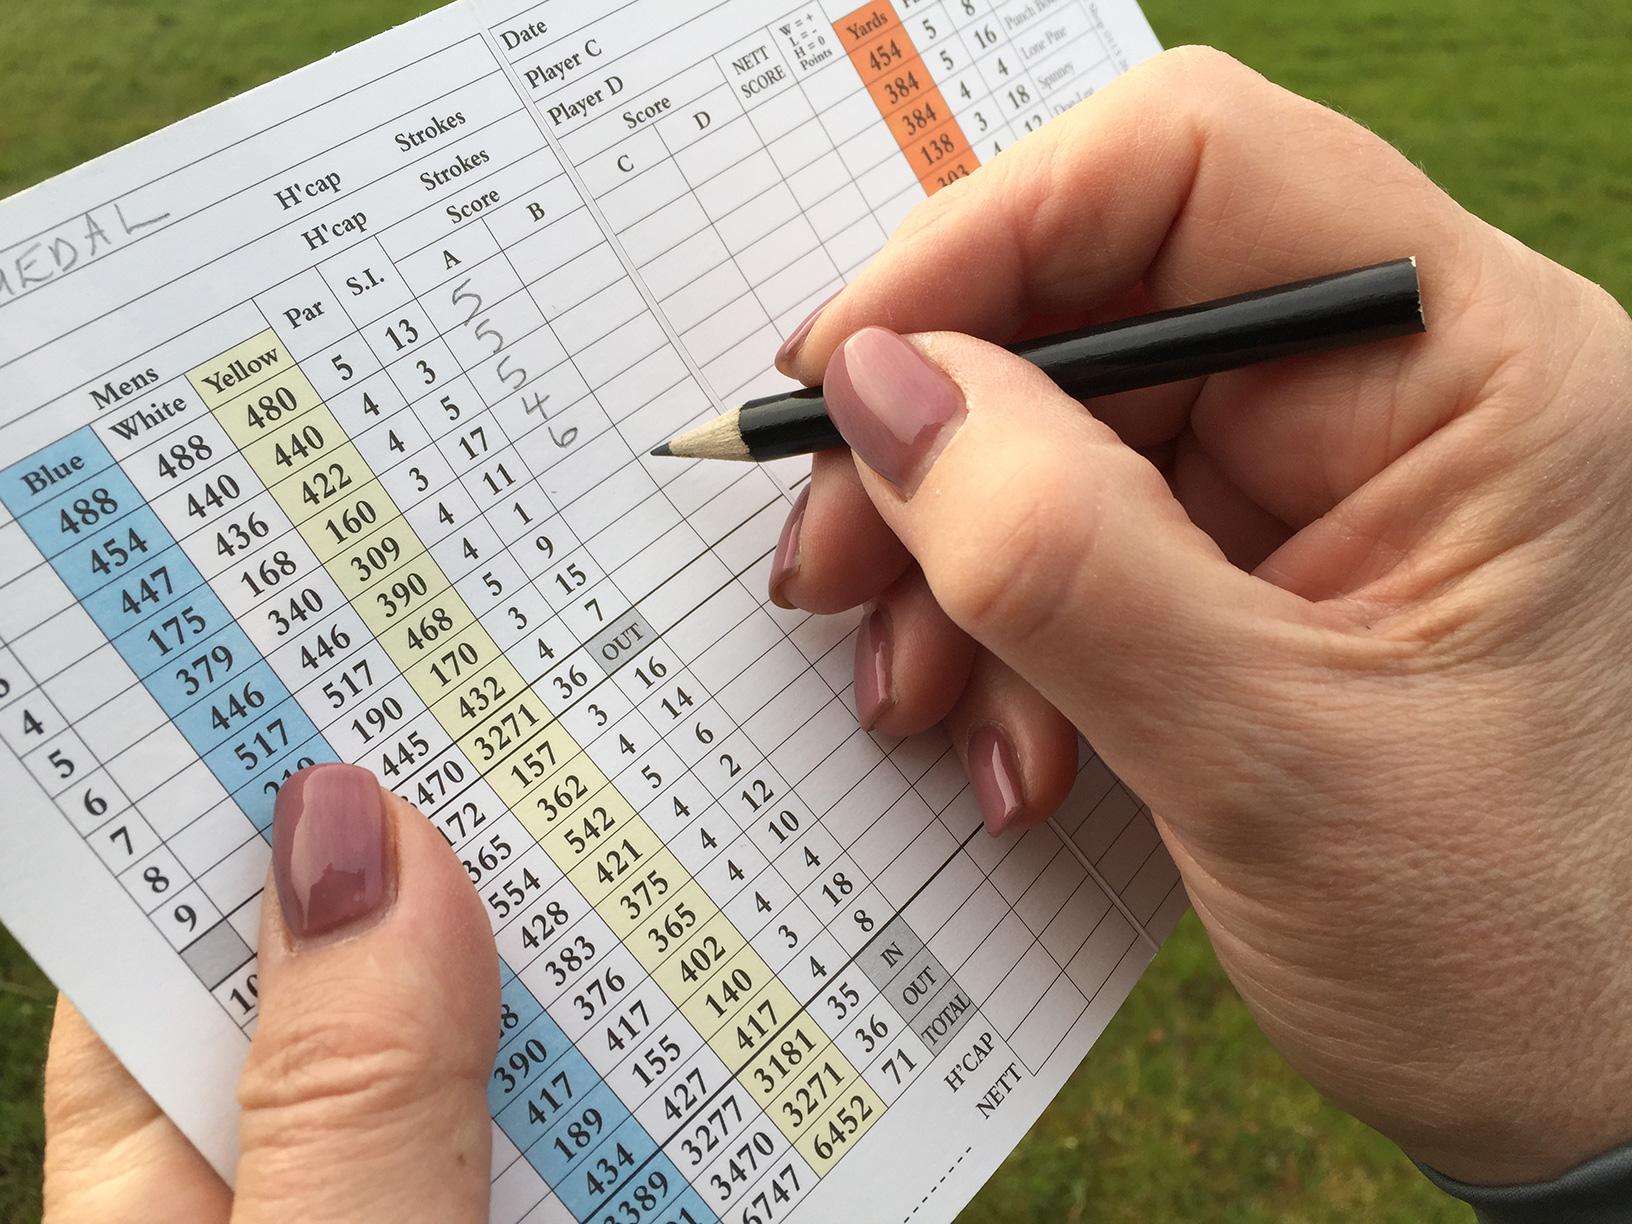 England Golf has helped golfers understand the new World Handicap System